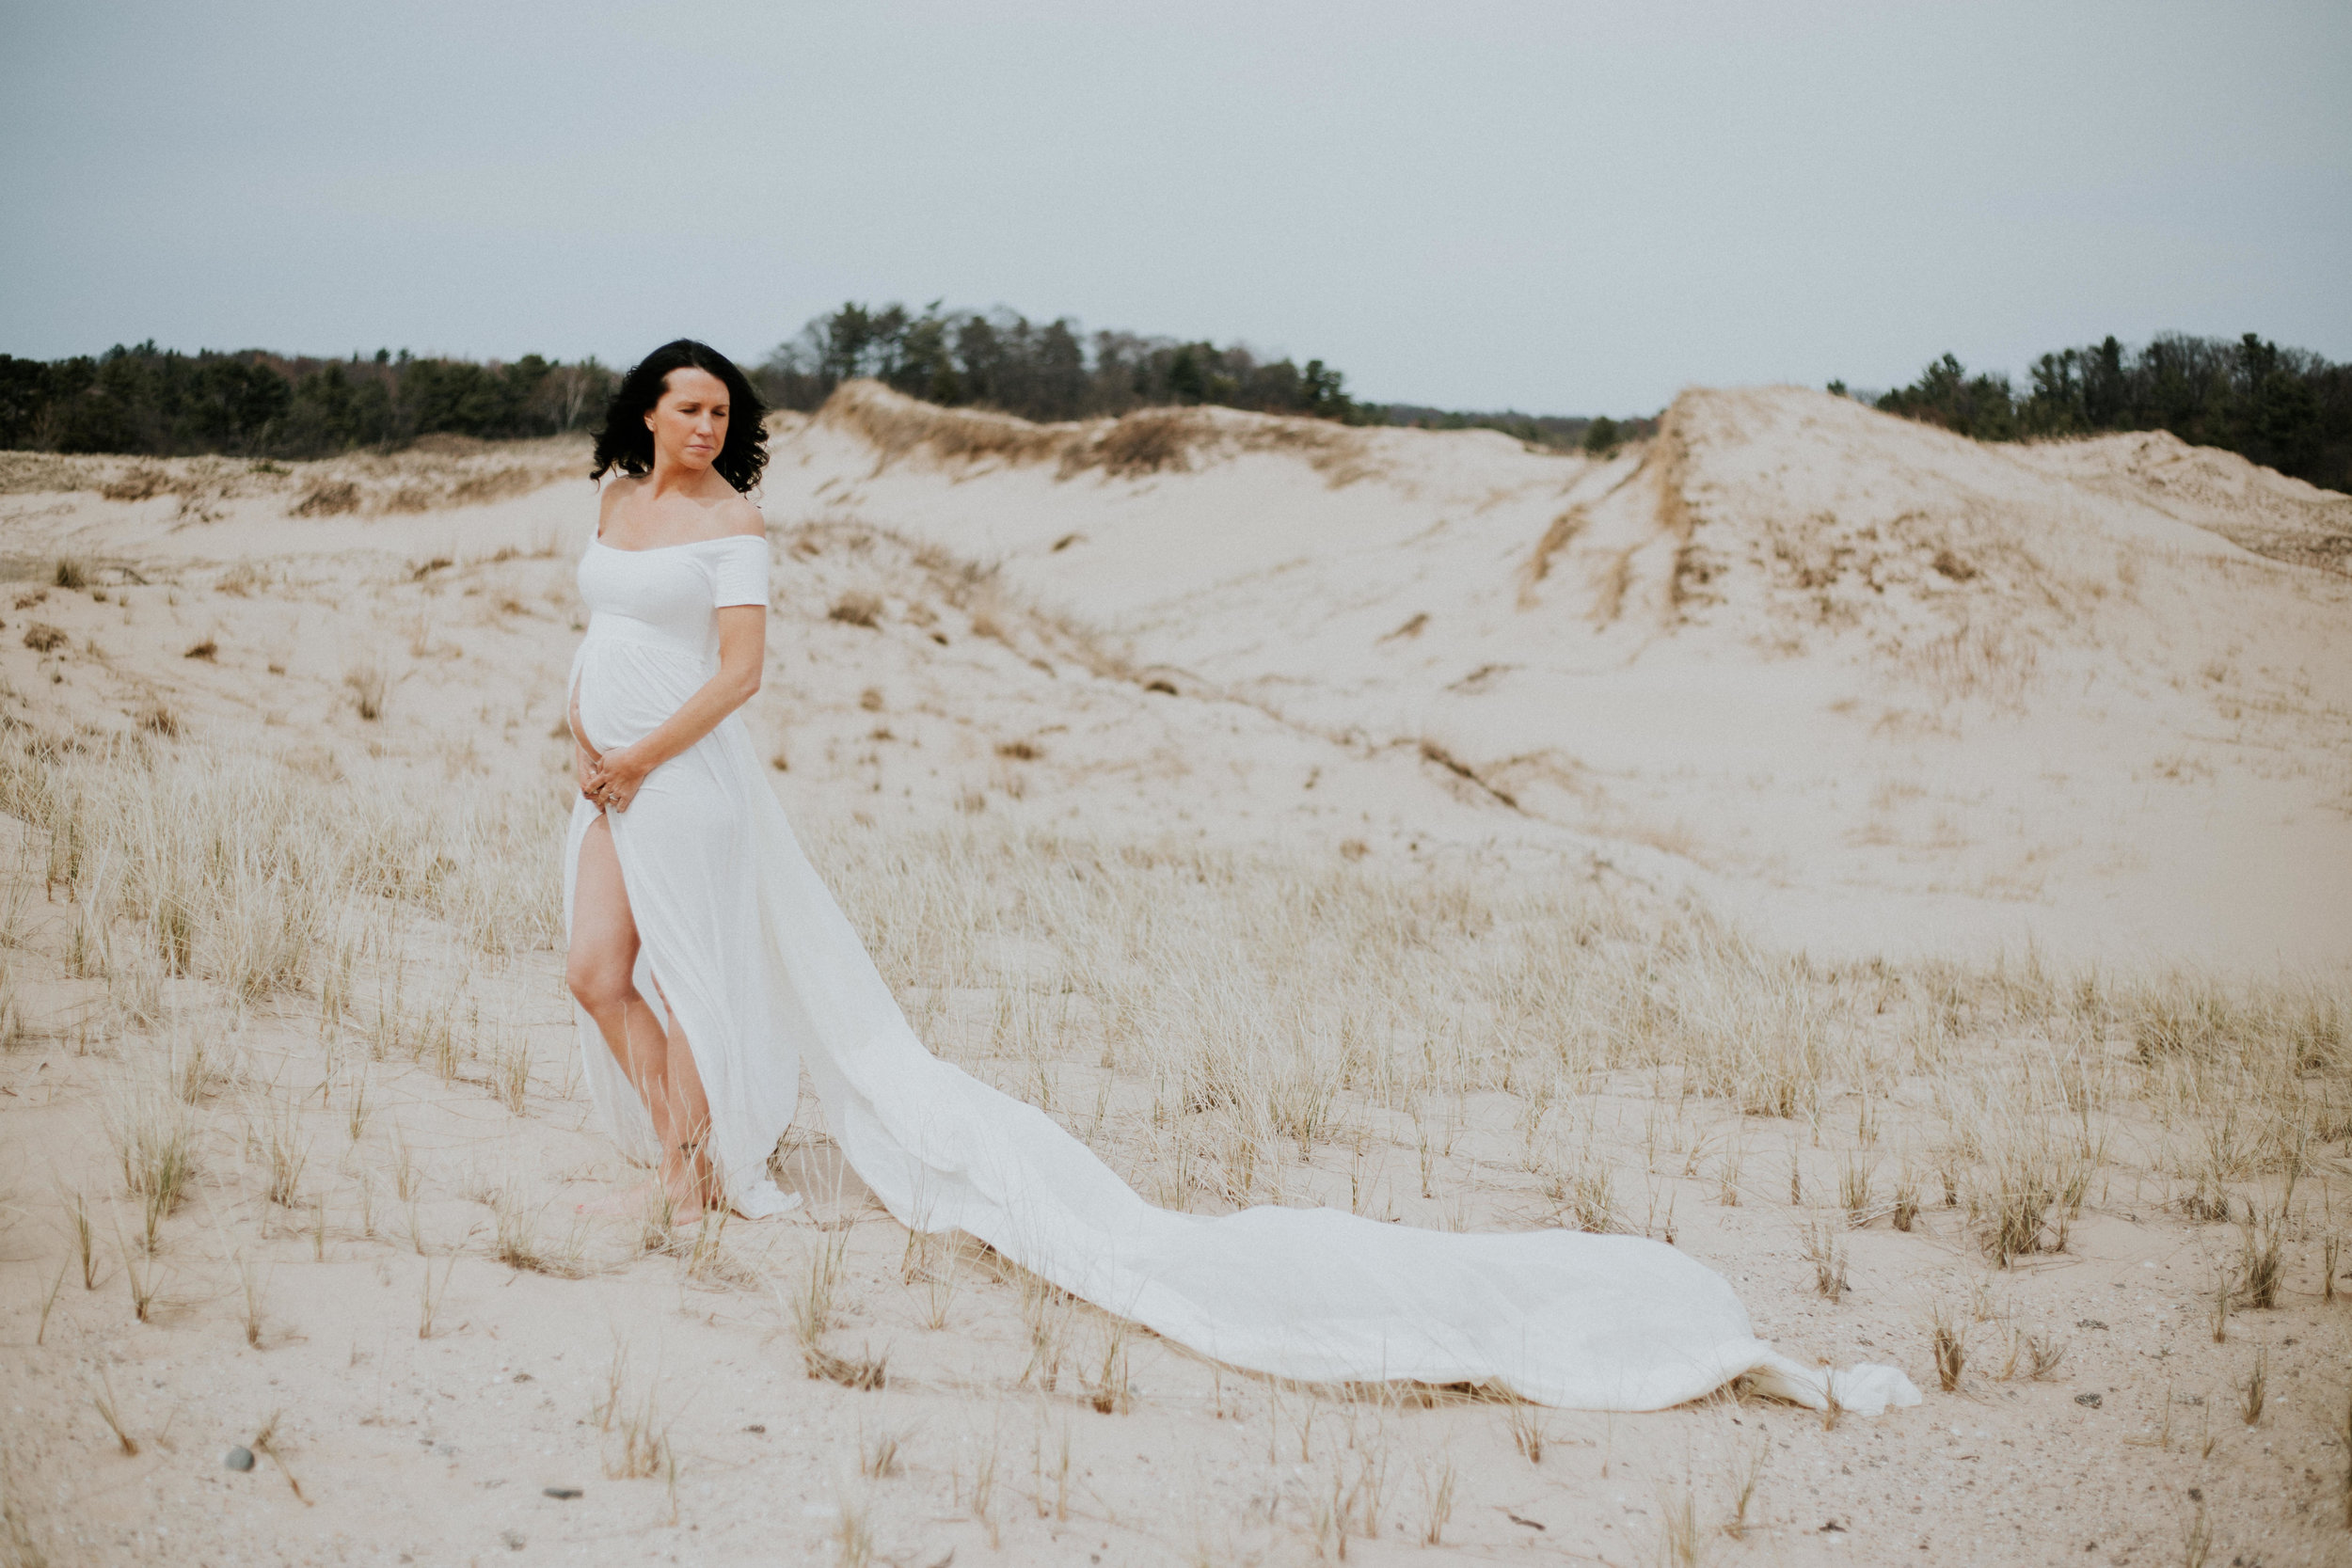 michigan-maternity-photographer-motherhood-ludington-michigan-motherhood-maternity-session-with-jessica-max-9941.jpg